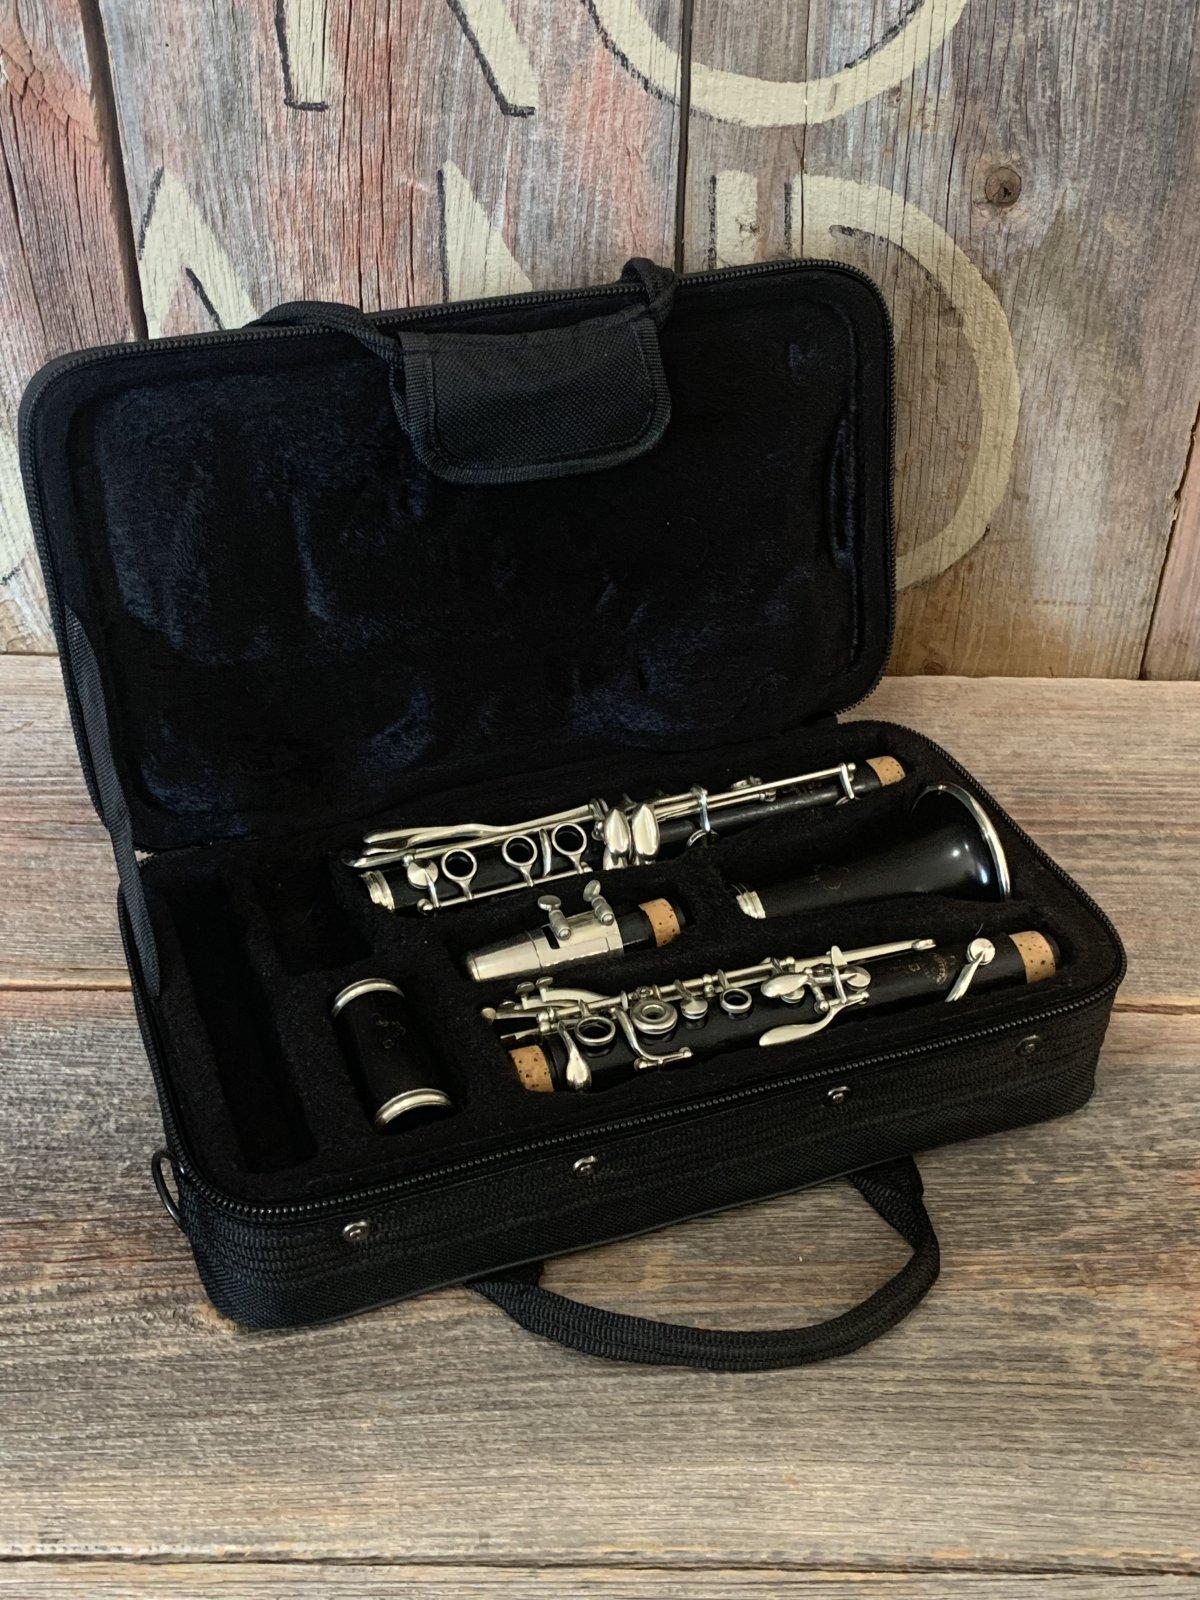 Buffet Crampon 1933 Bb Clarinet Pre R-13 - Used